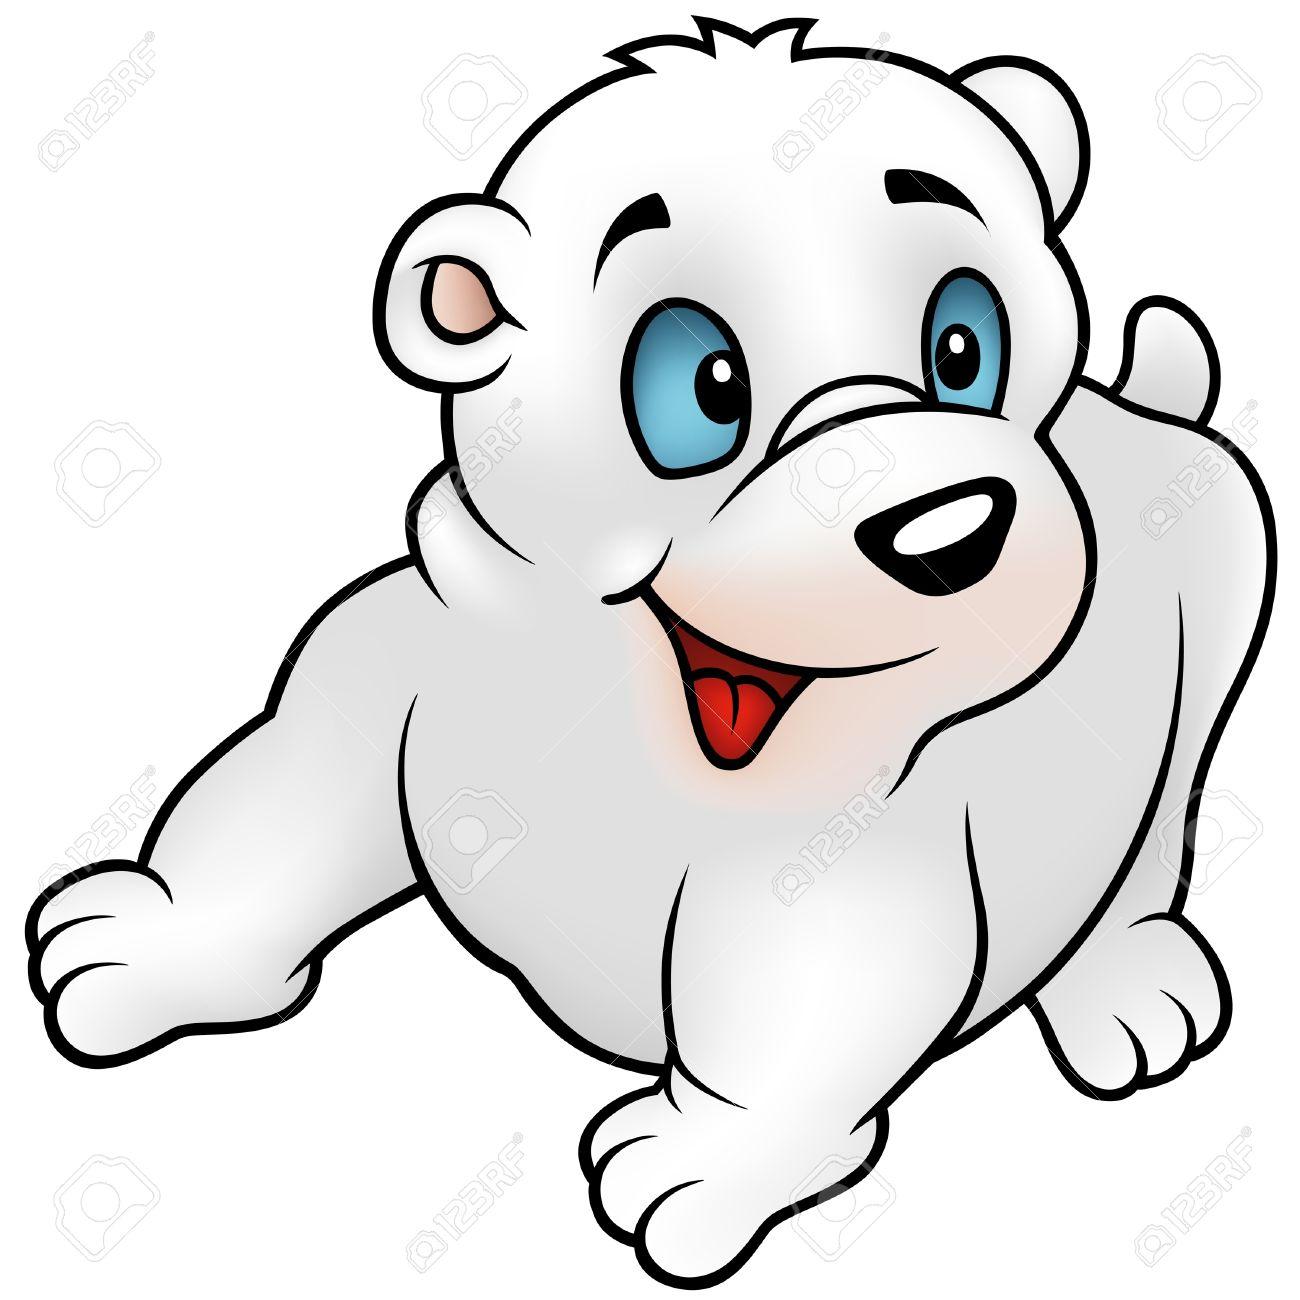 Oso Polar, Puppy - Ilustración De Dibujos Animados Color + Vector ...